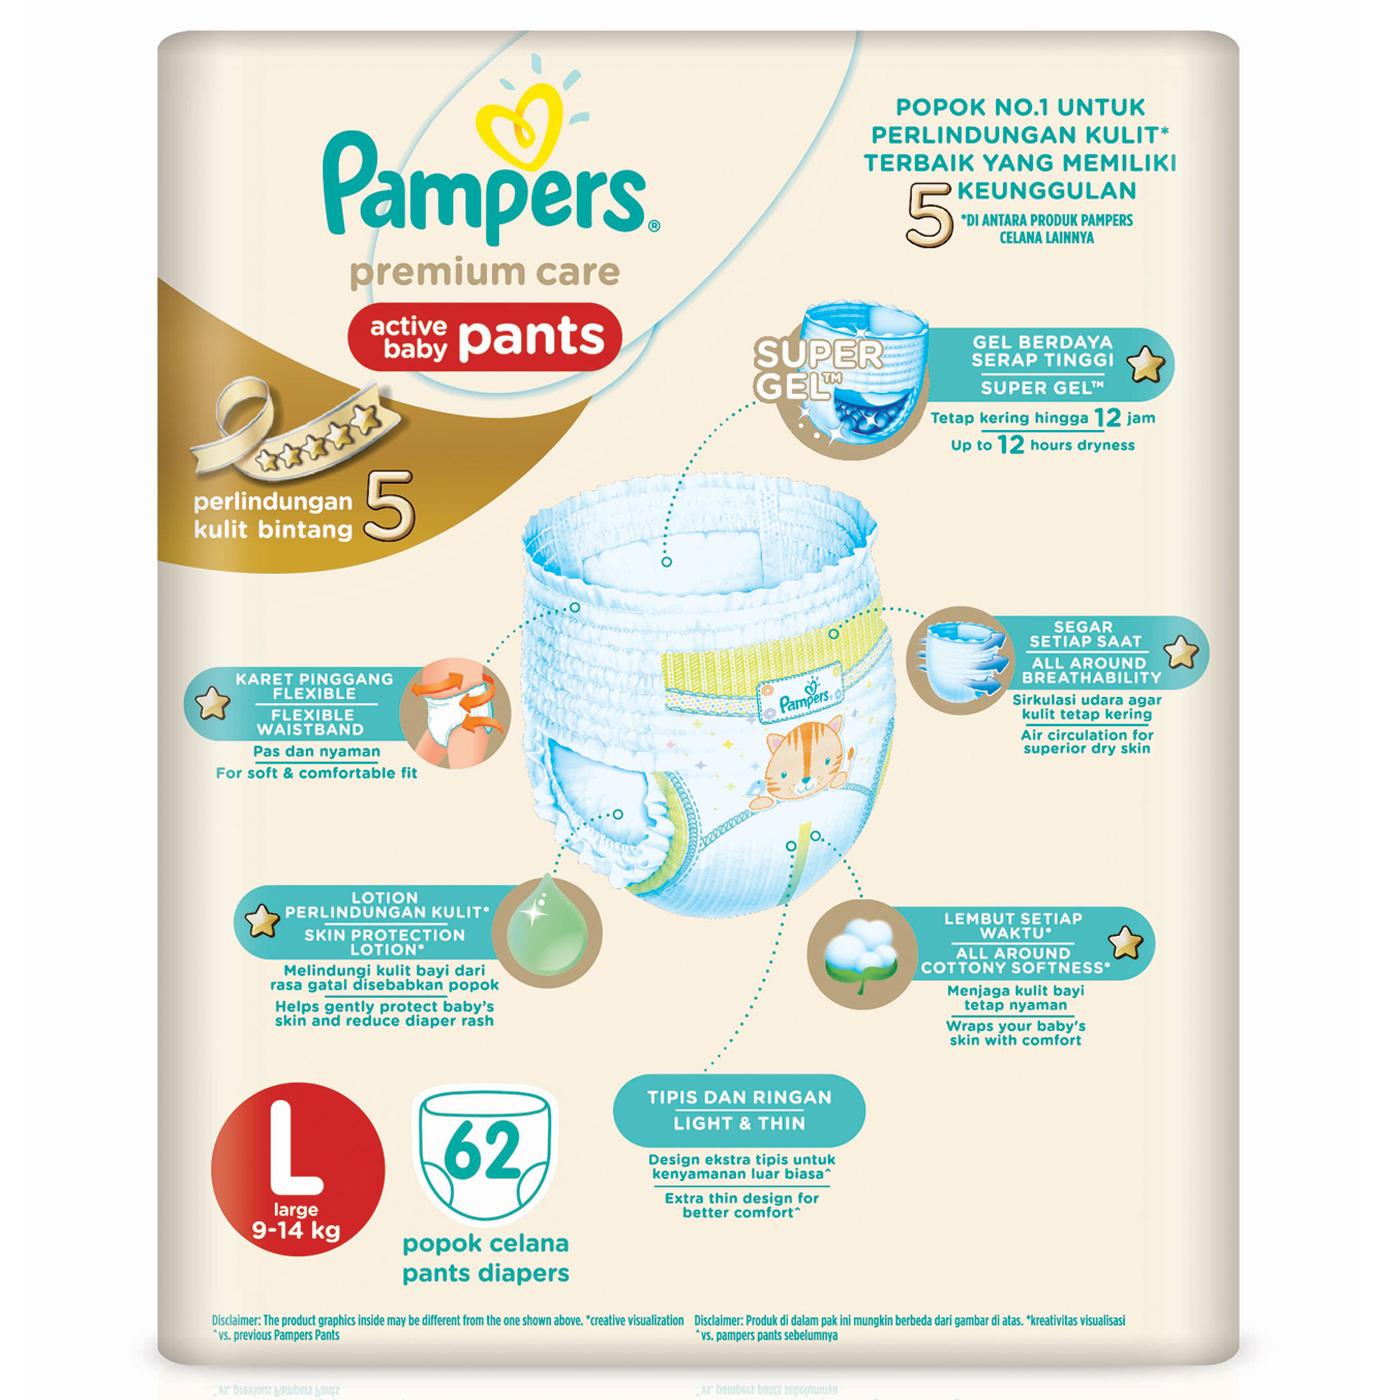 Pampers Popok Celana L-62 Premium Care 2